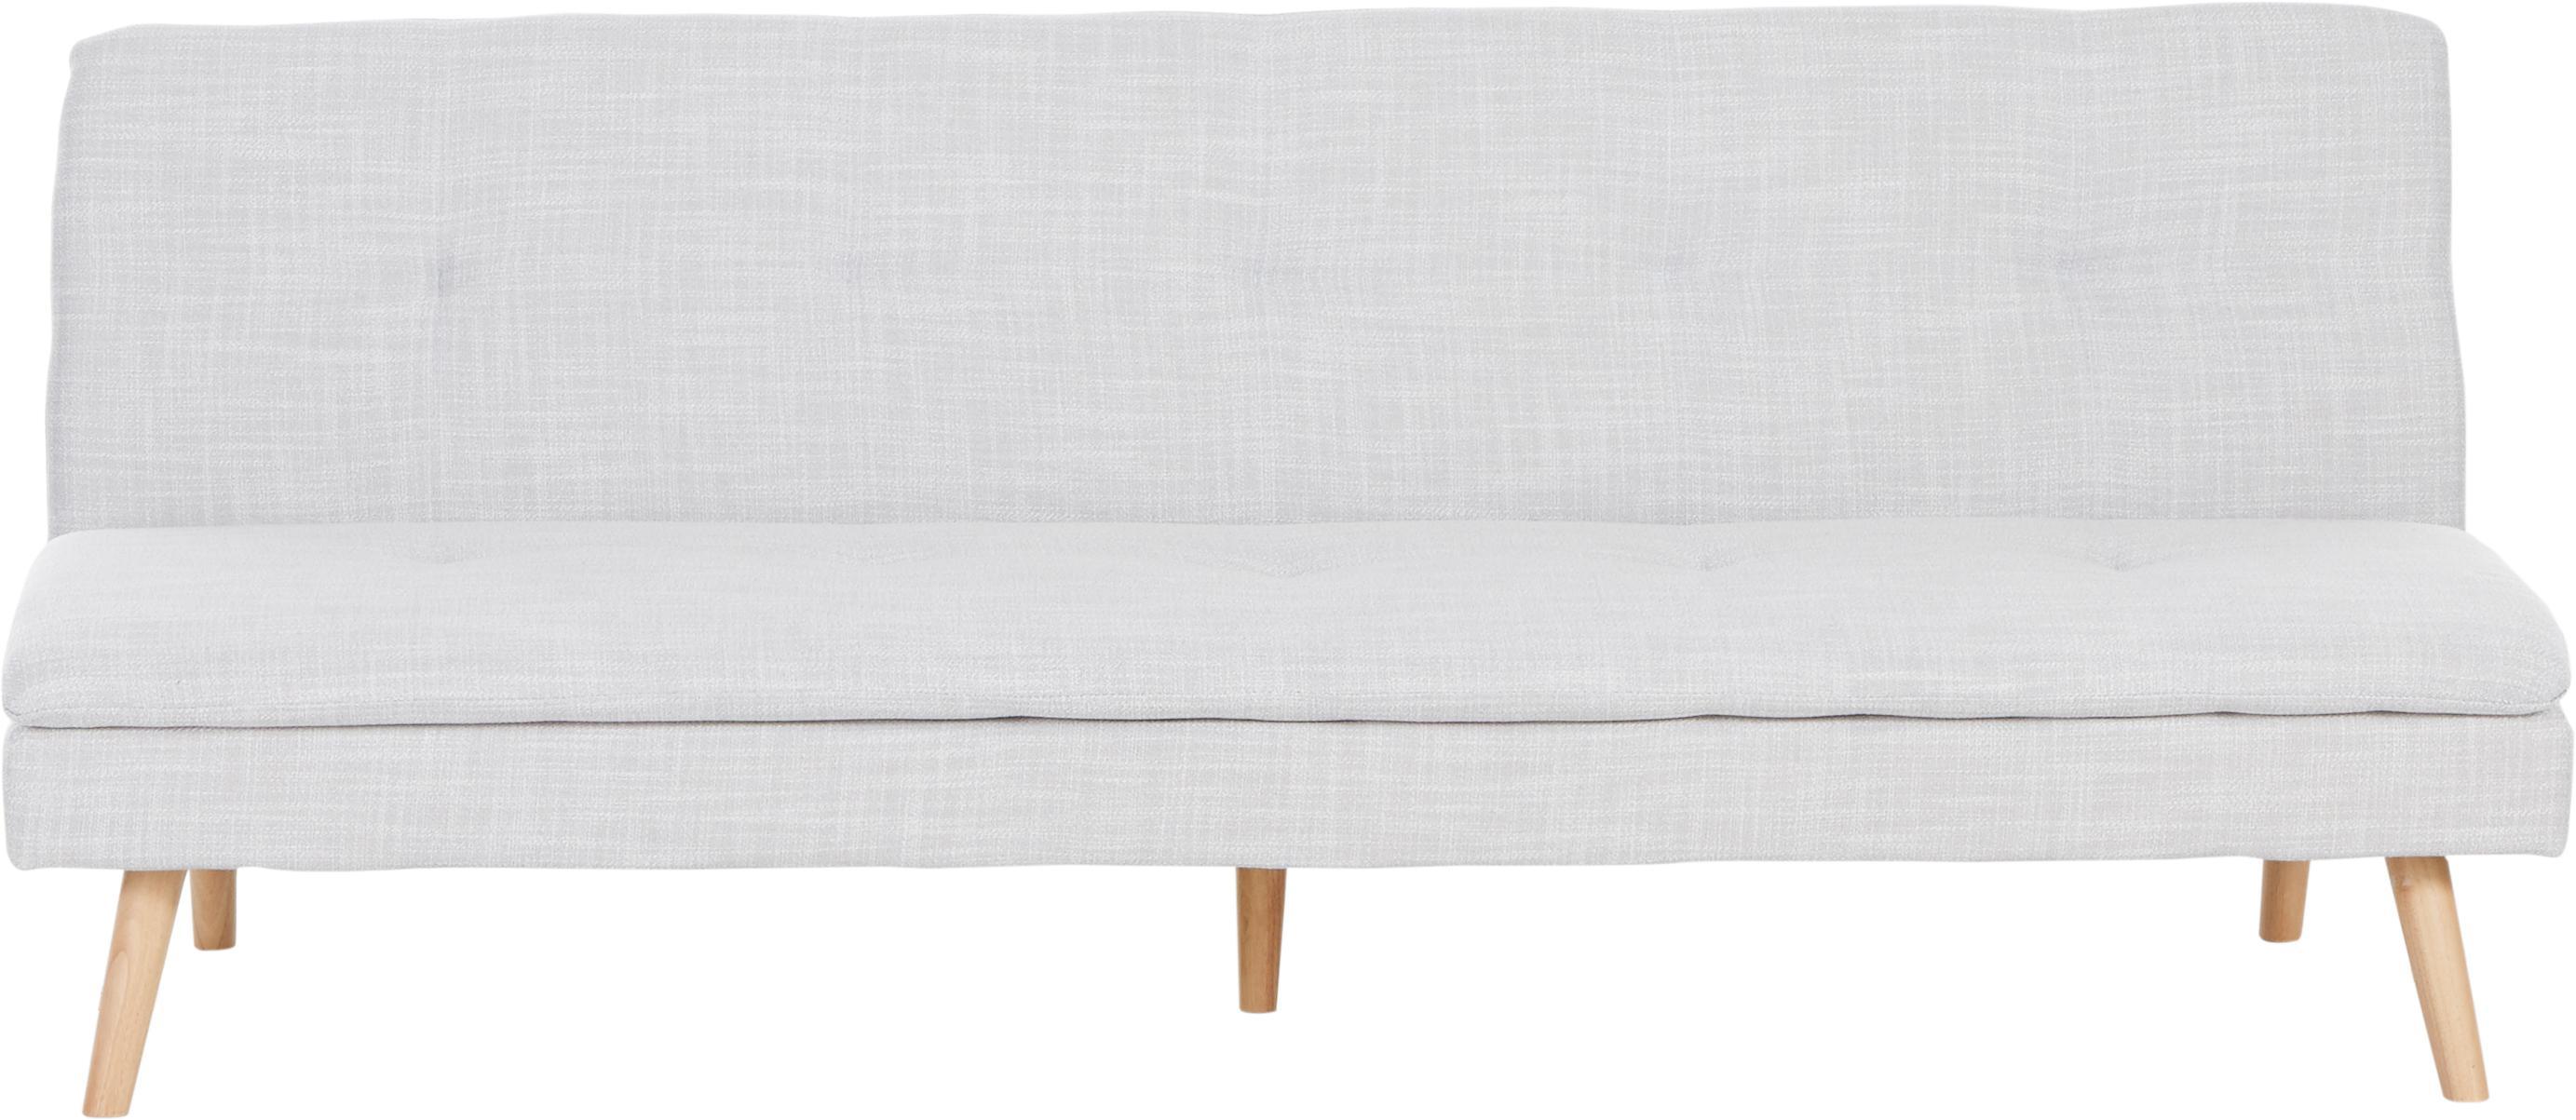 Schlafsofa Amelie, Bezug: Polyester Der hochwertige, Gestell: Kiefernholz Dichte 35 kg/, Webstoff Hellgrau, 200 x 79 cm